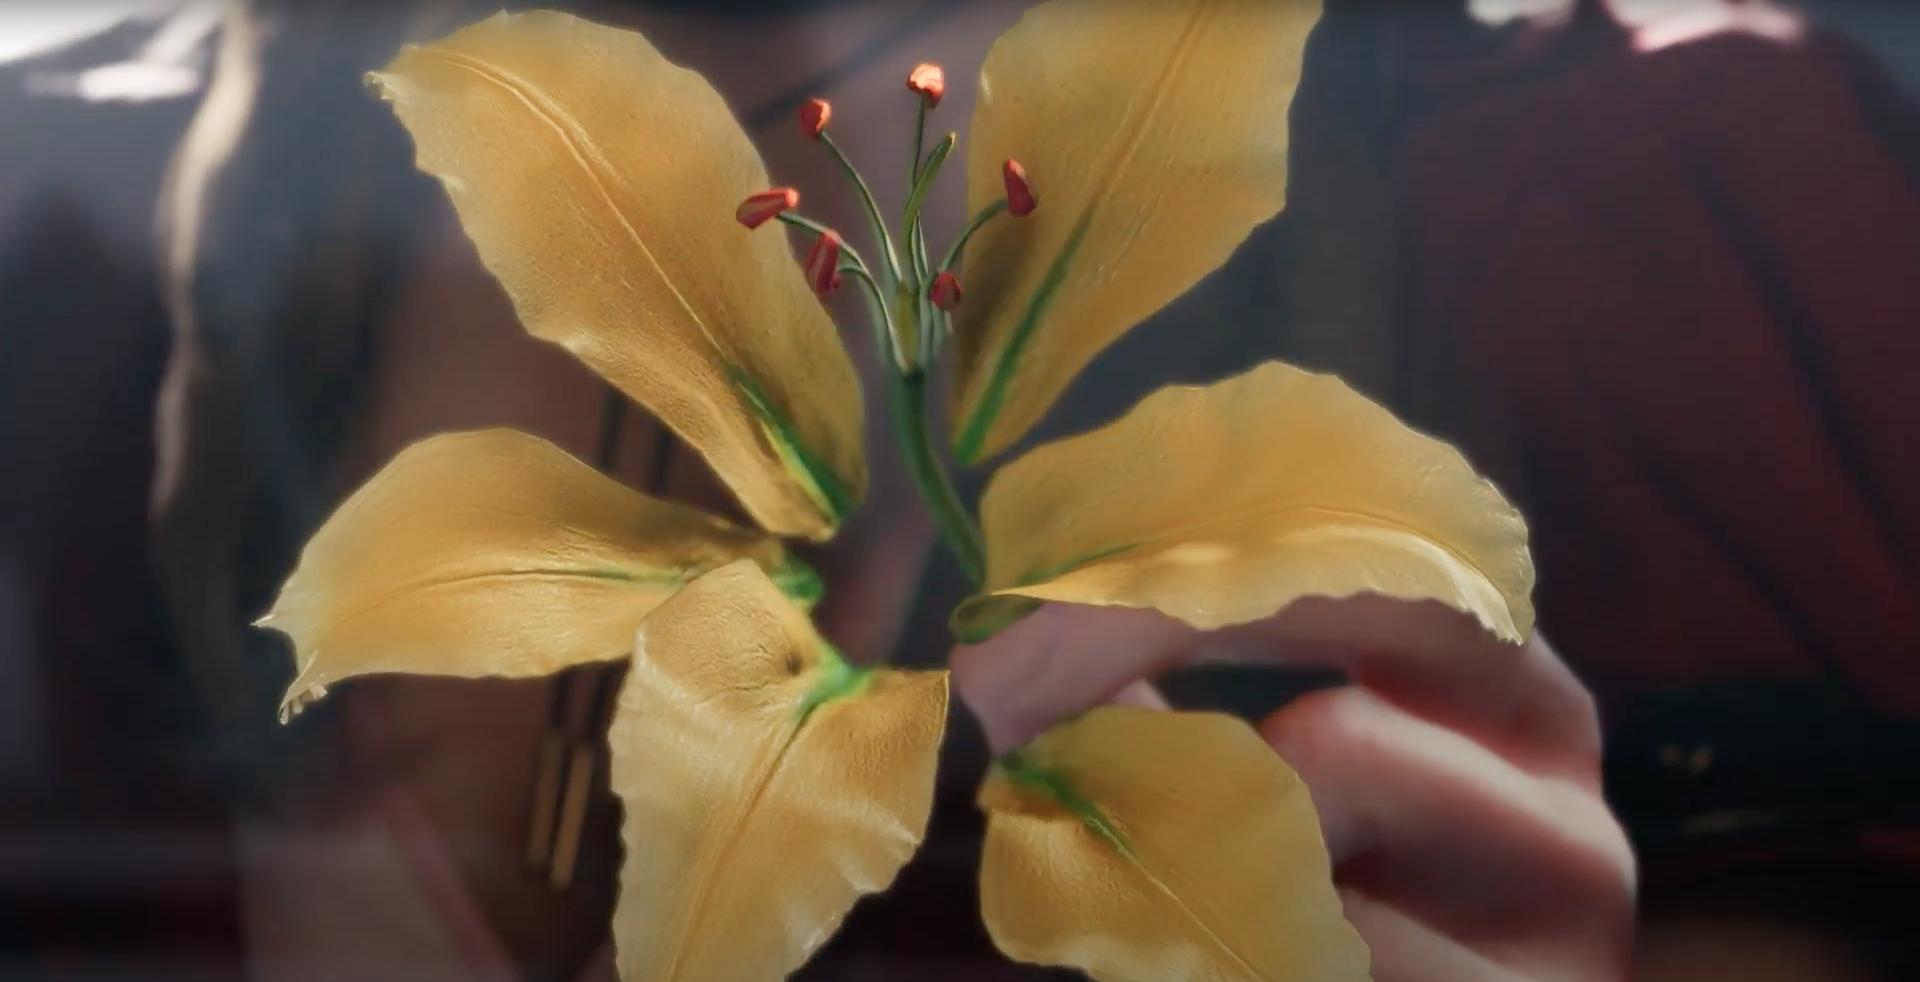 Follow them, the Yellow Flowers